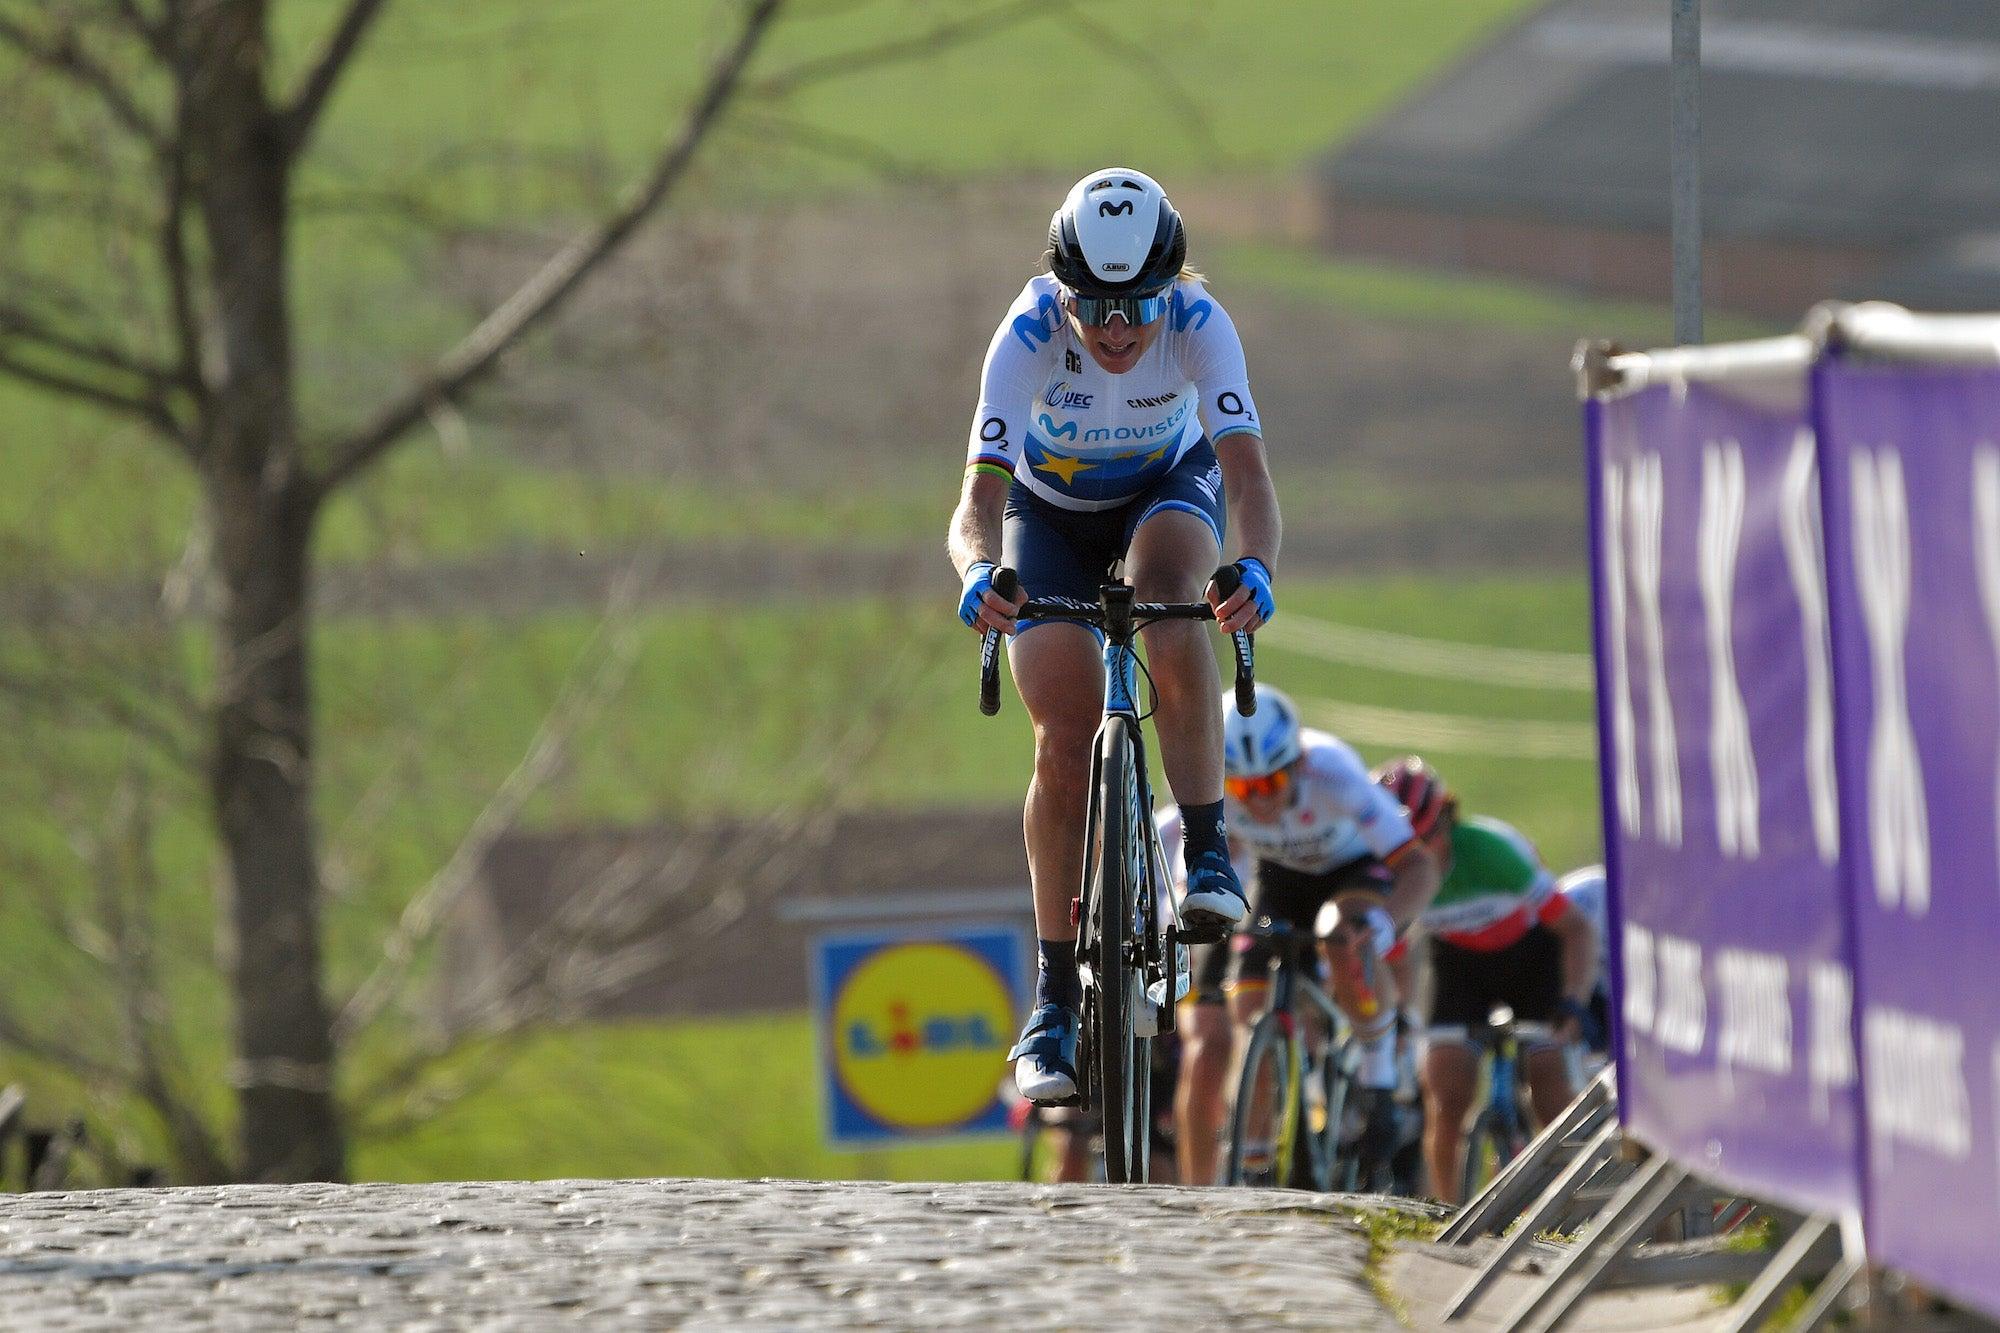 Redux Tour of Flanders: quali sono le prospettive di Kasper Asgreen e Annemiek van Vleuten?